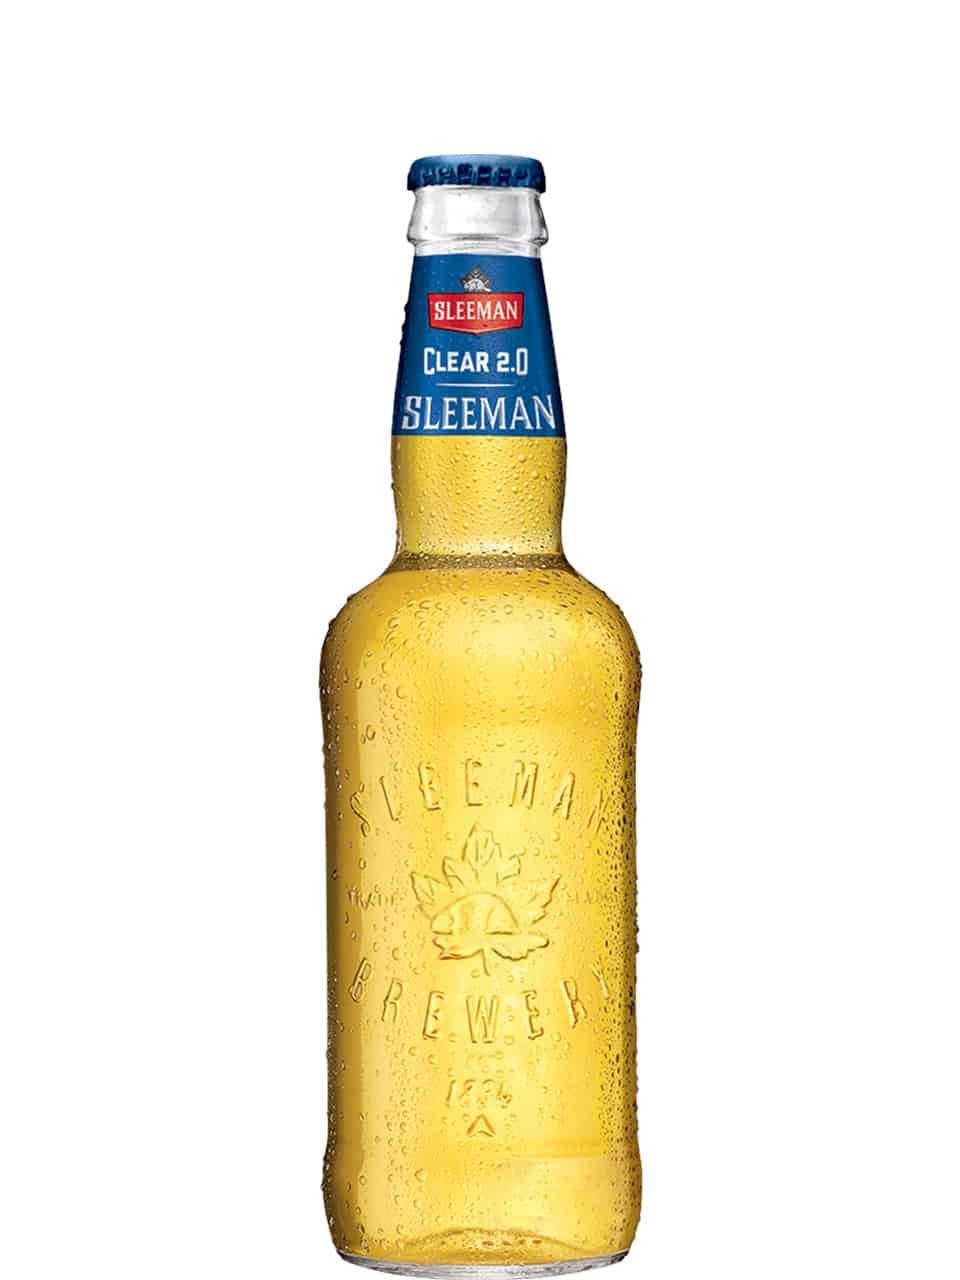 Sleeman Clear 2.0 15pk Bottles